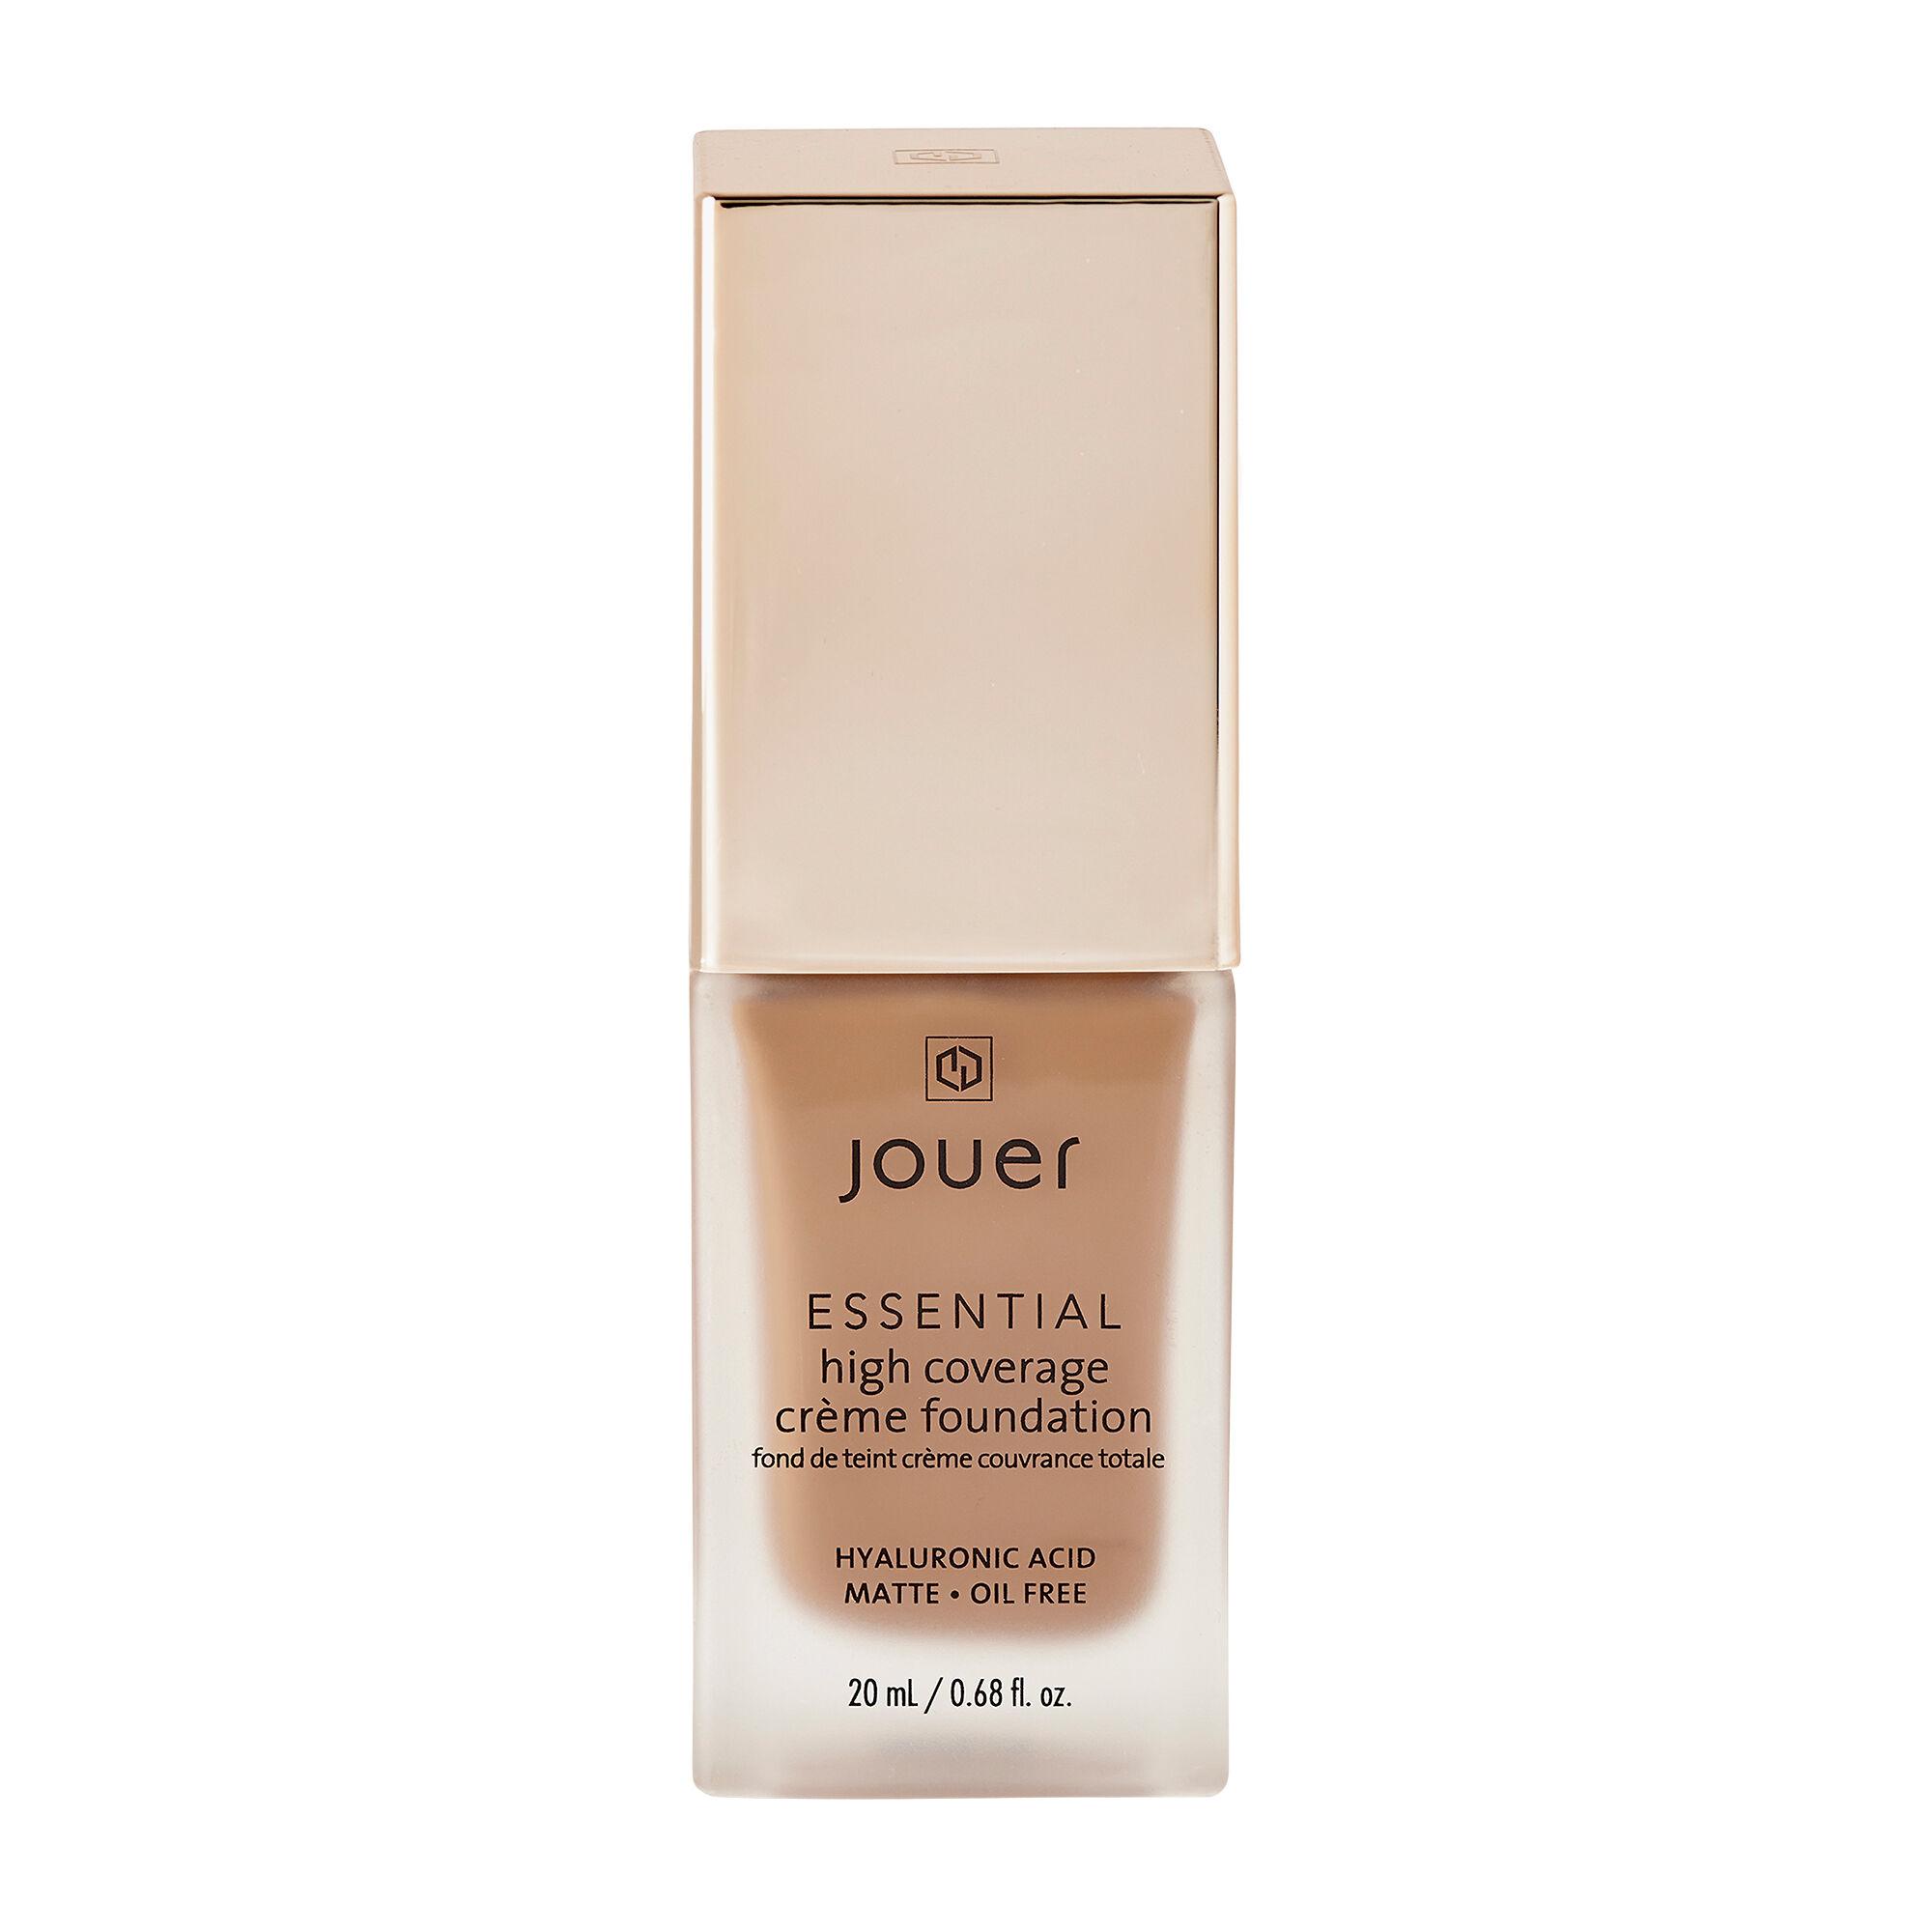 Jouer Cosmetics Essential High Coverage Creme Foundation Mocha 20ml